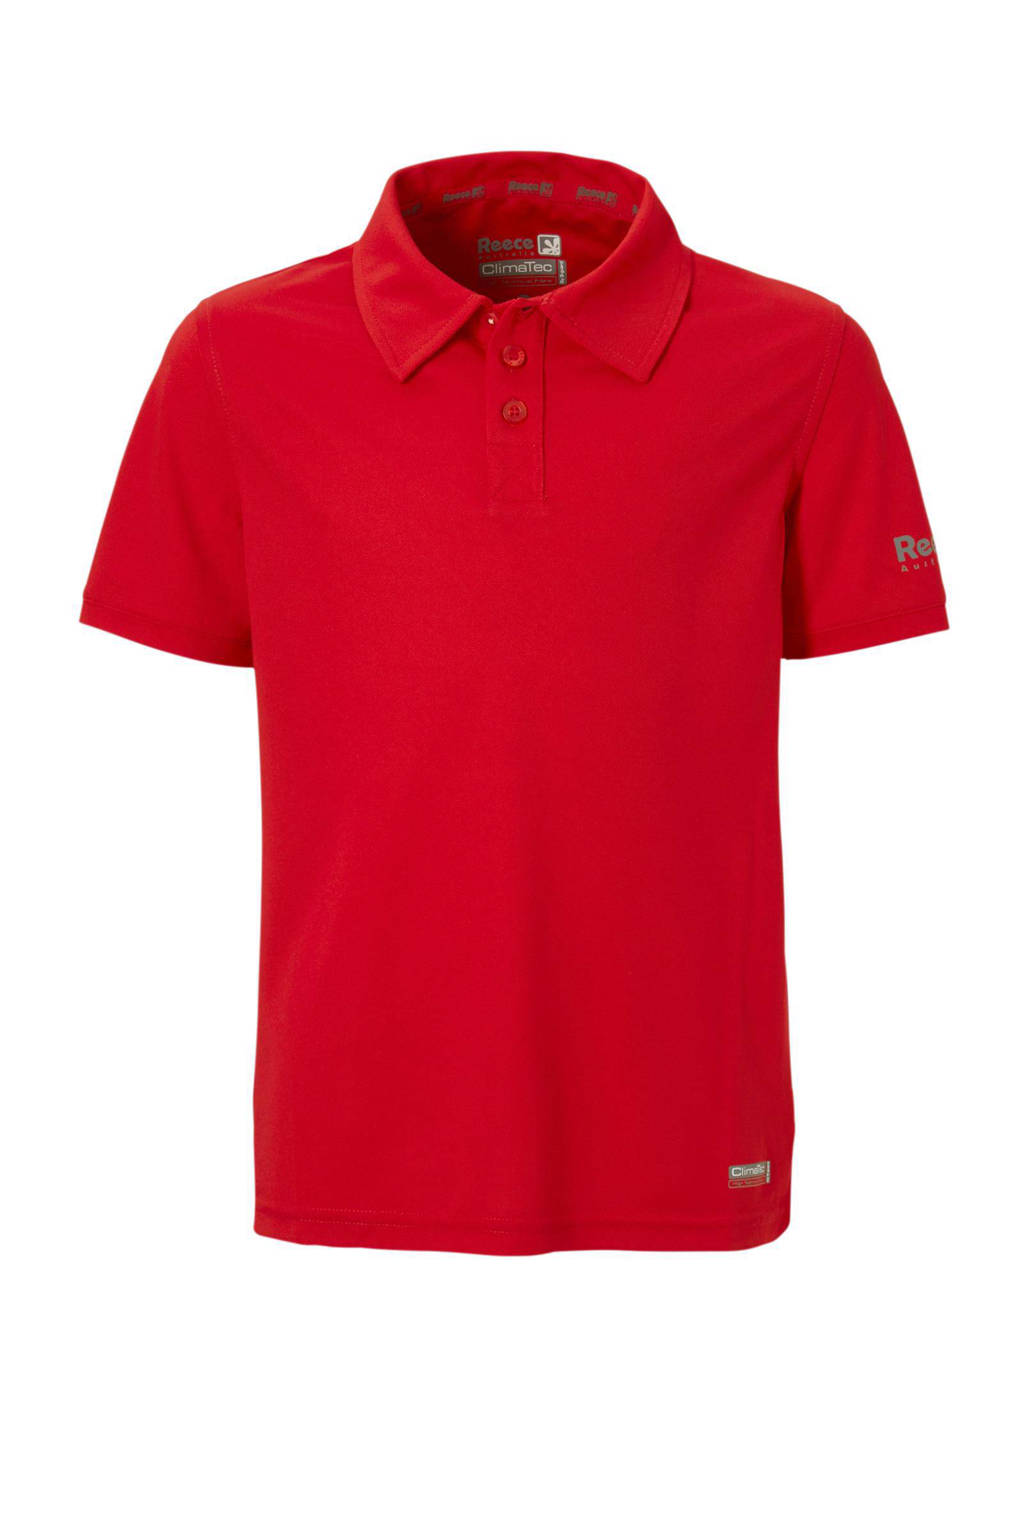 Reece Australia   sportpolo rood, Rood